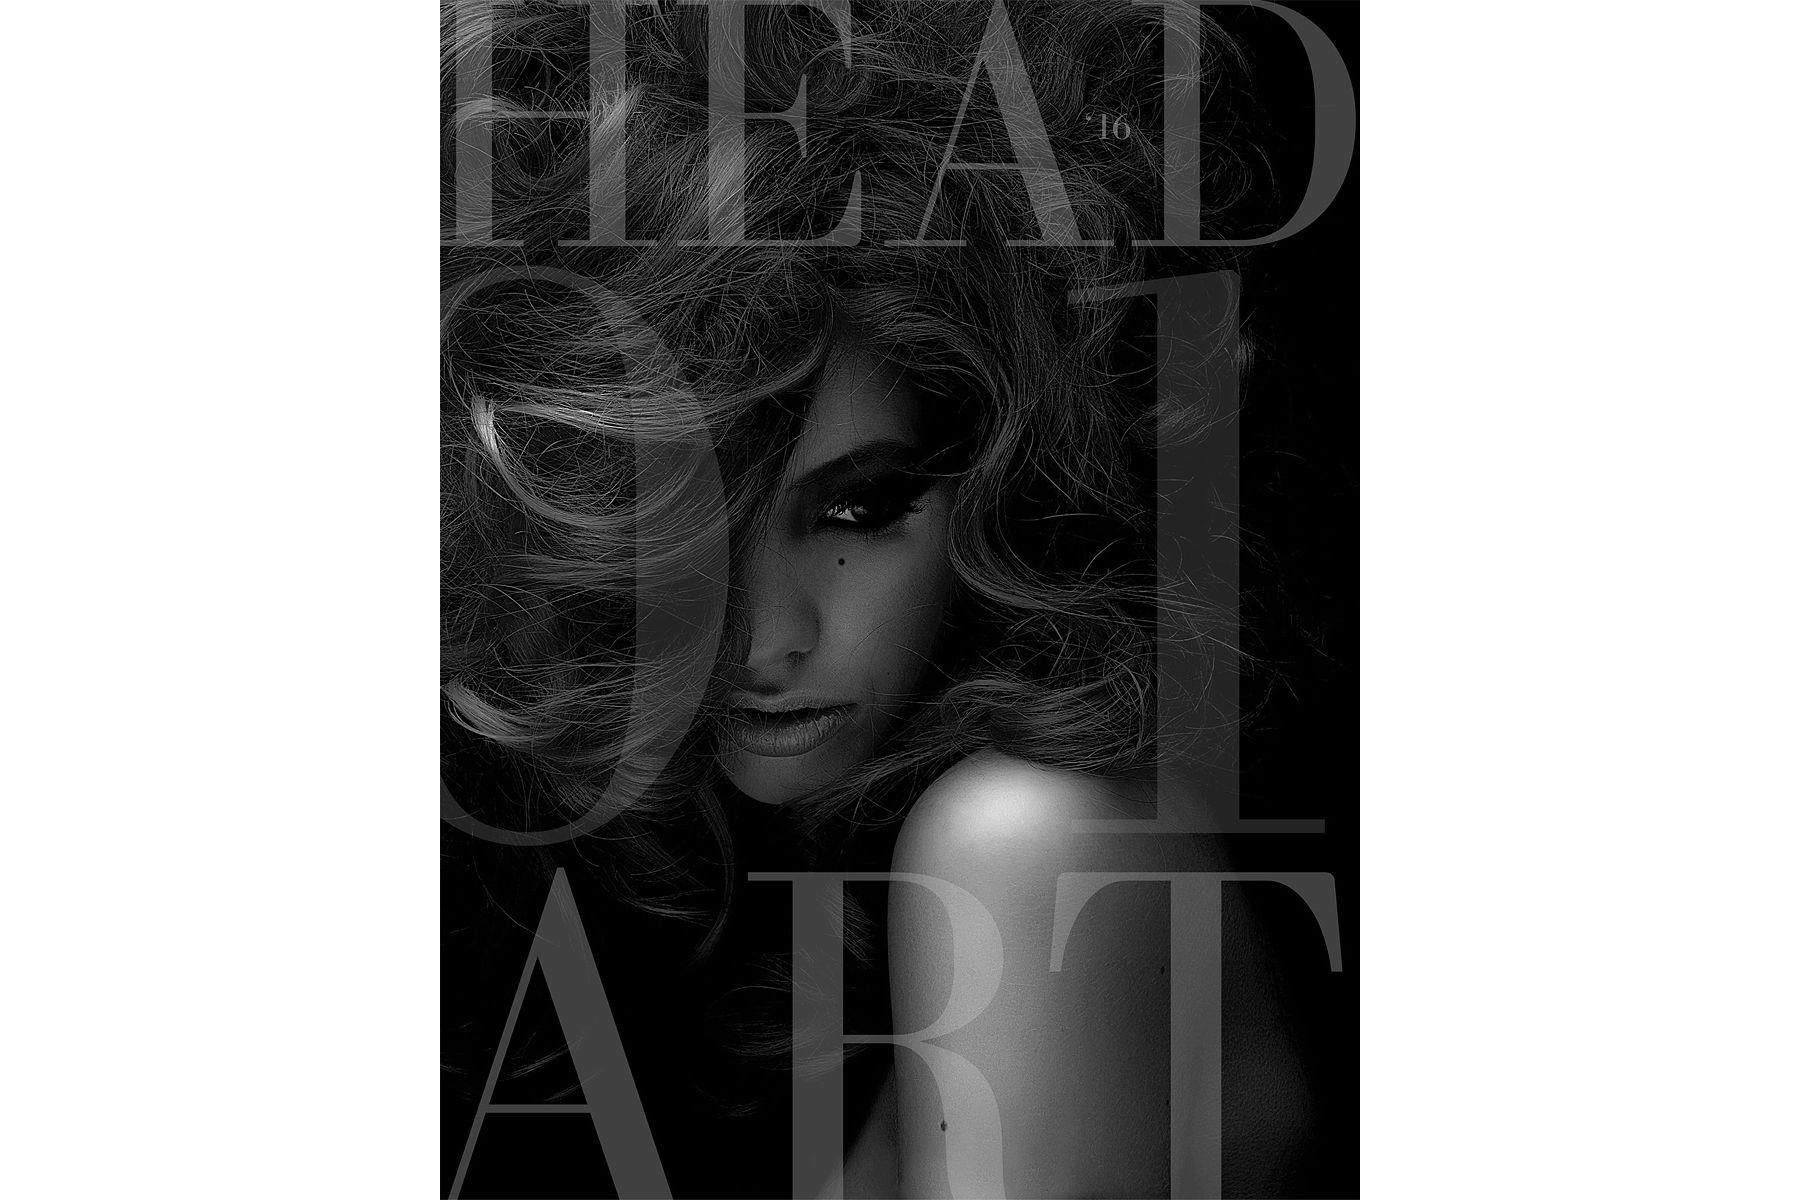 1headartfacebookcover.jpg